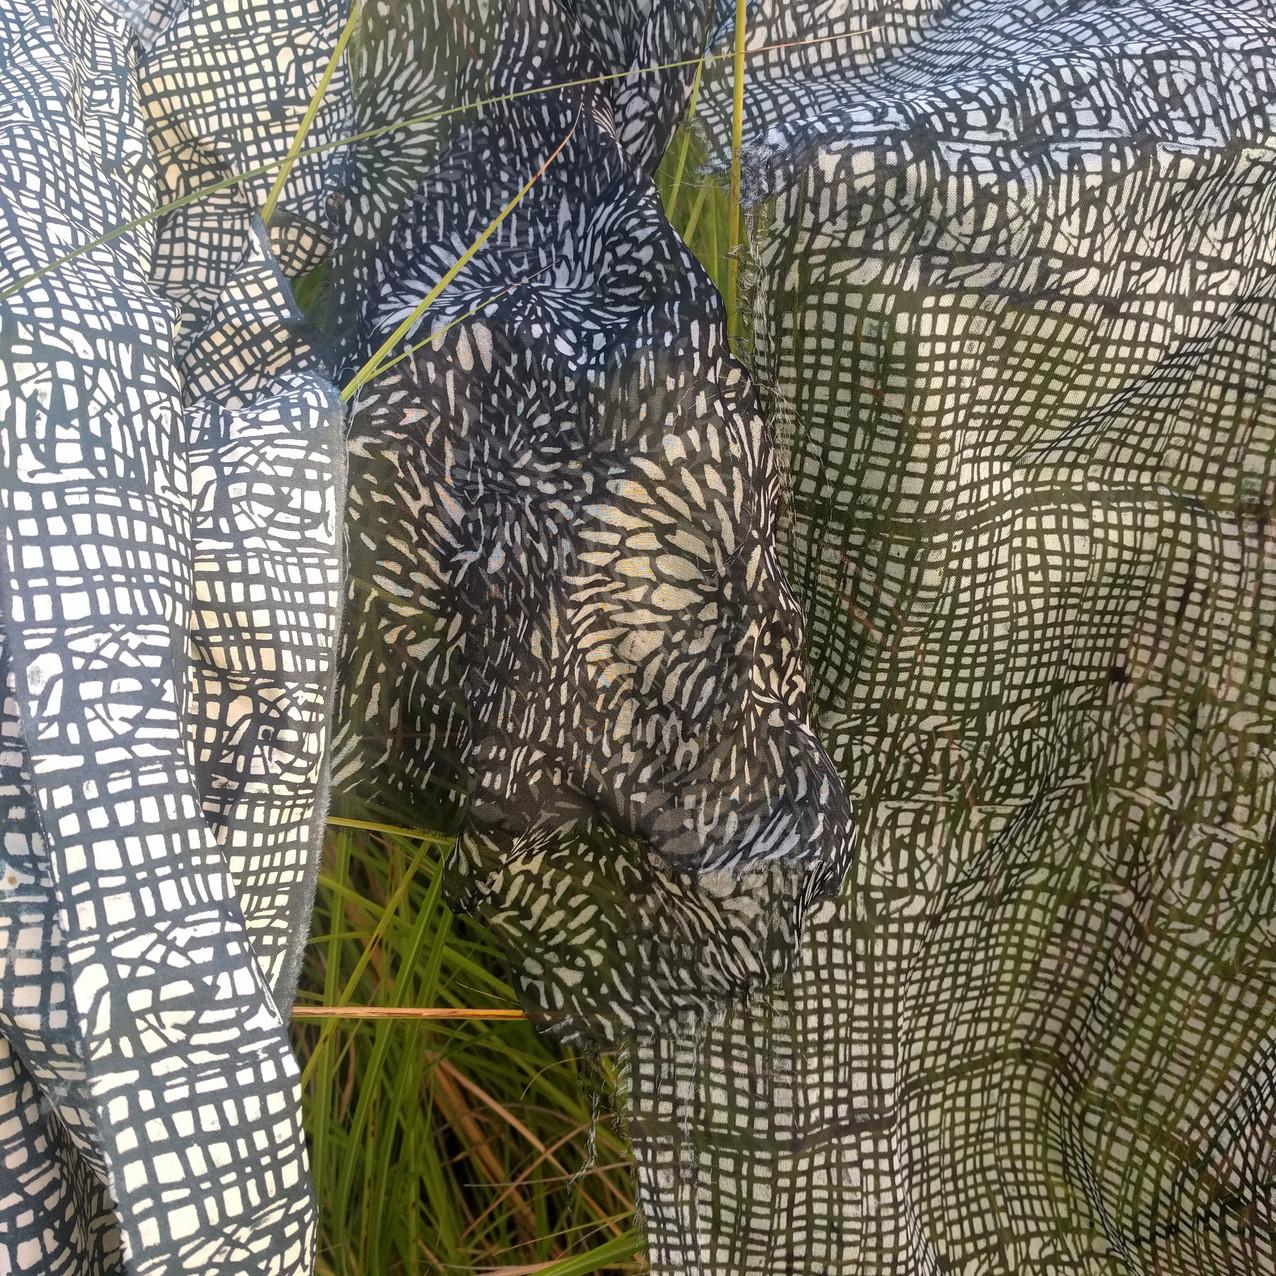 SD work Silks and reeds